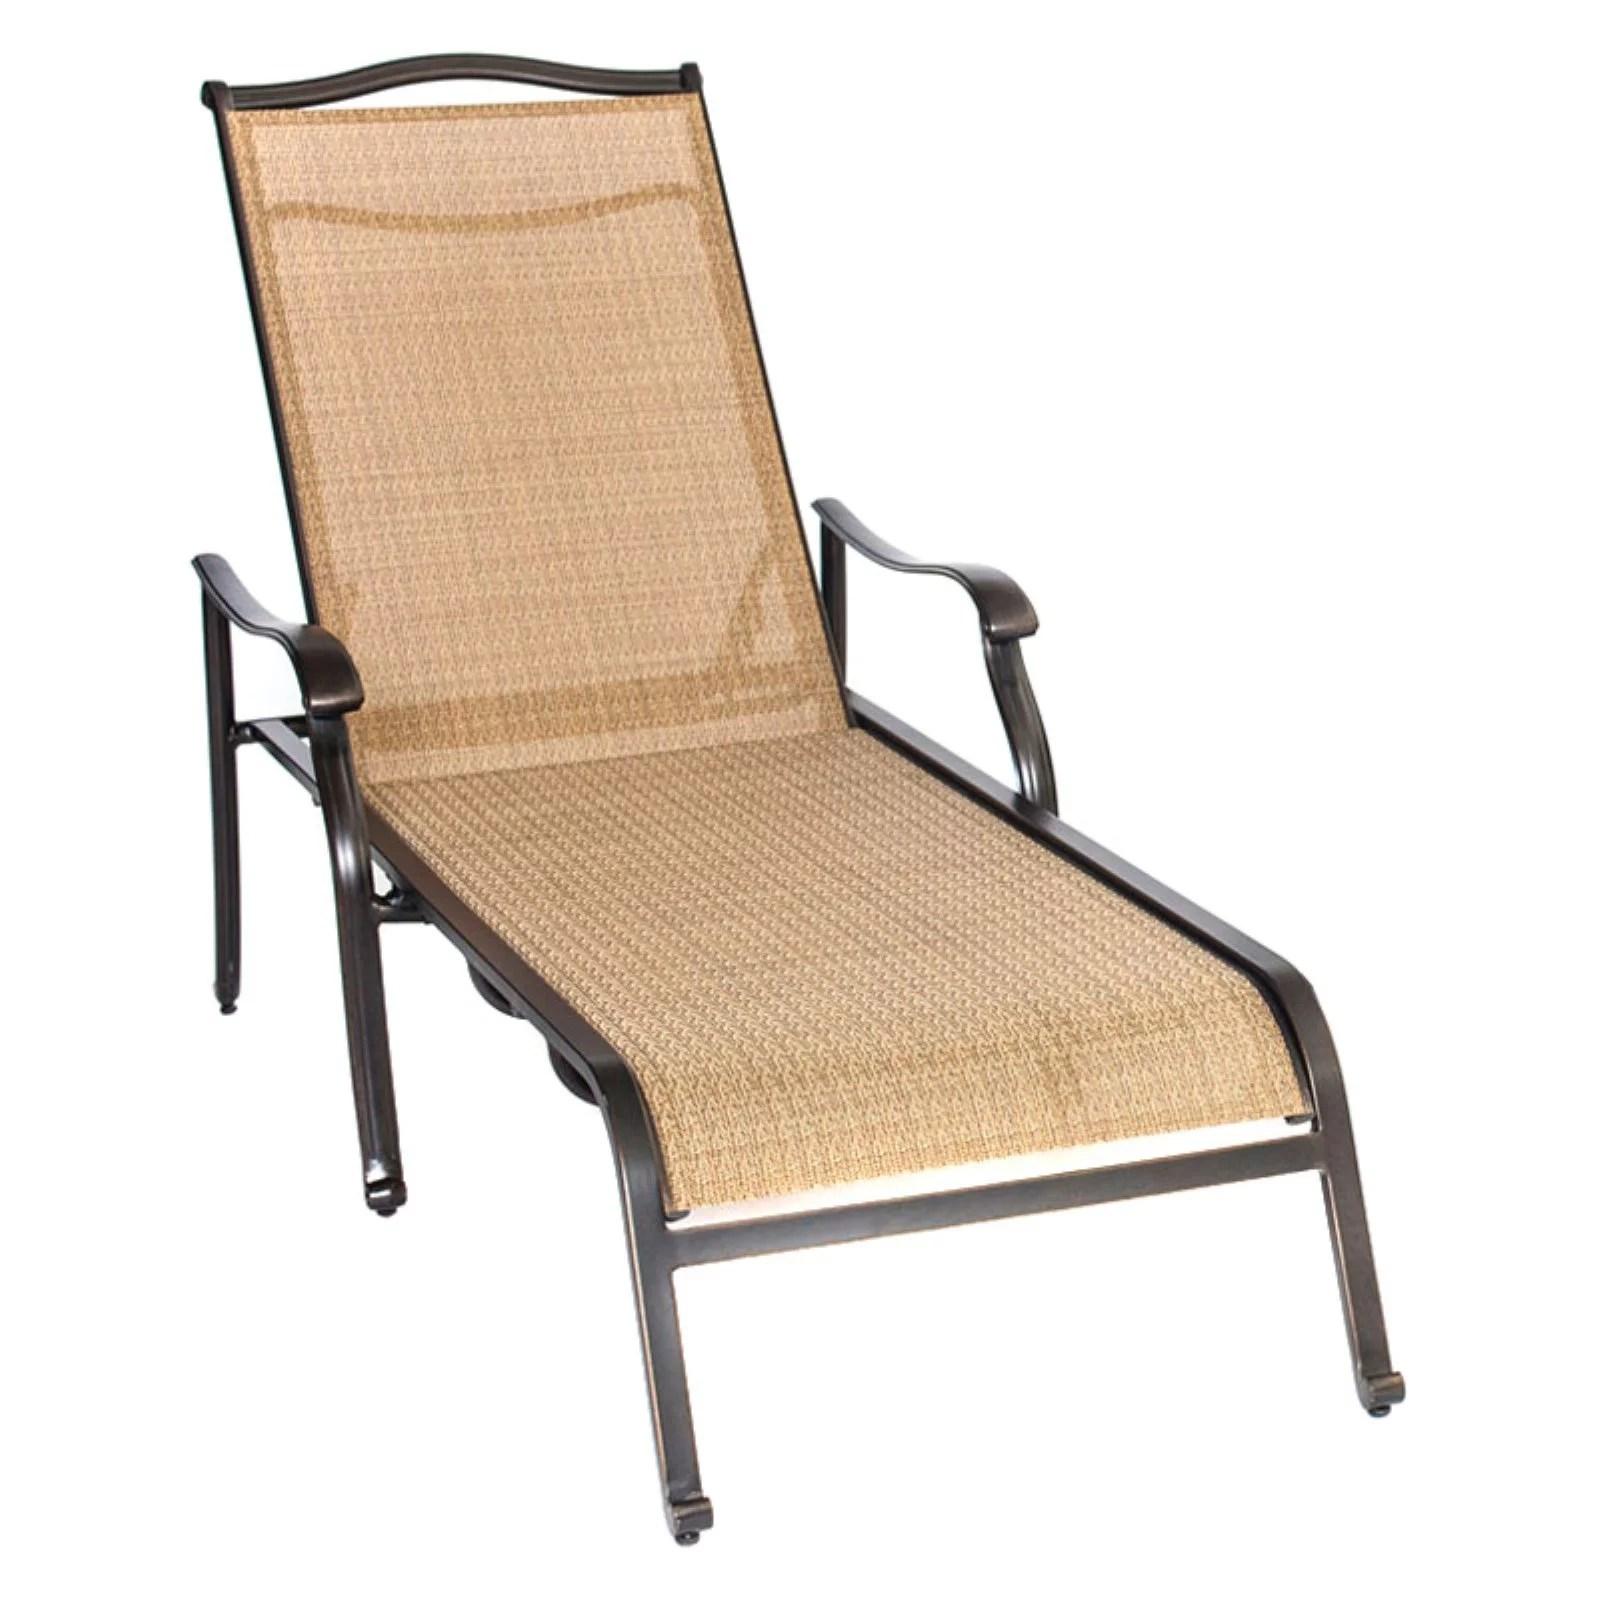 hanover outdoor monaco chaise lounge chair